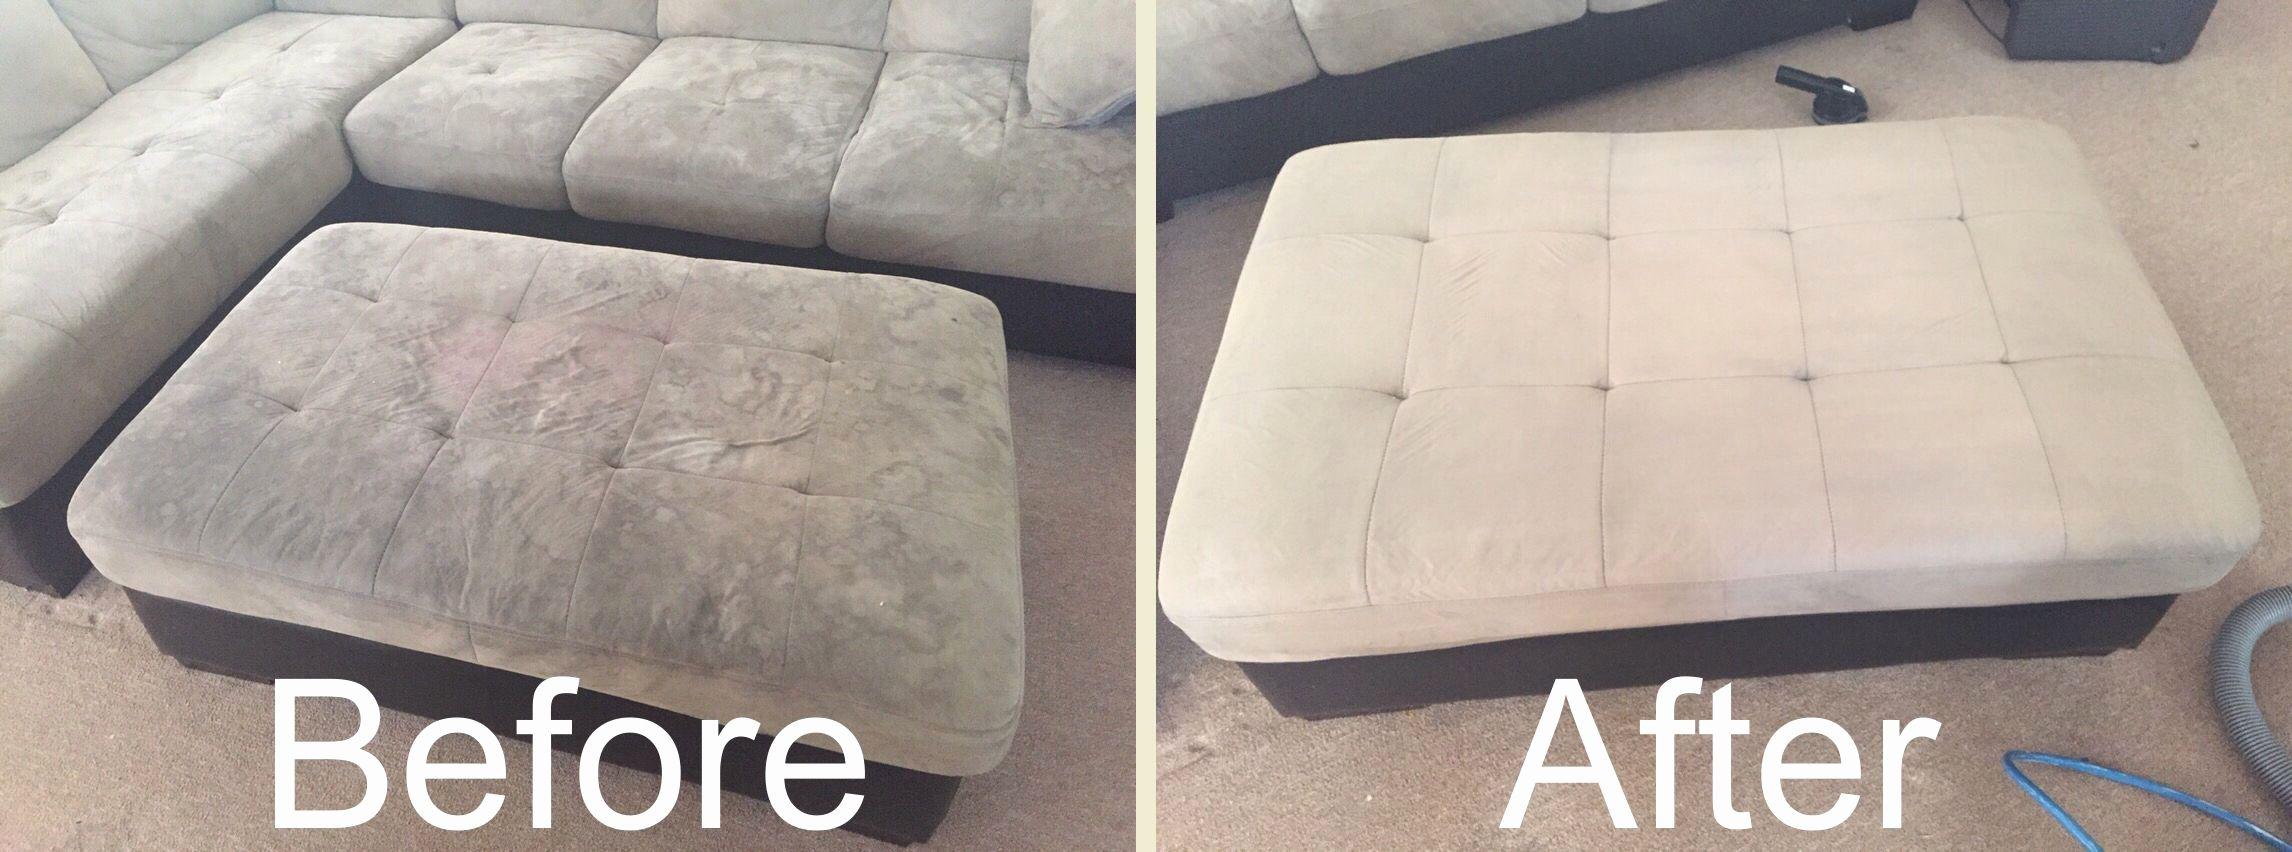 Best Of Microfiber Sofa Cleaner Microfiber Sofa Cleaner Best Of